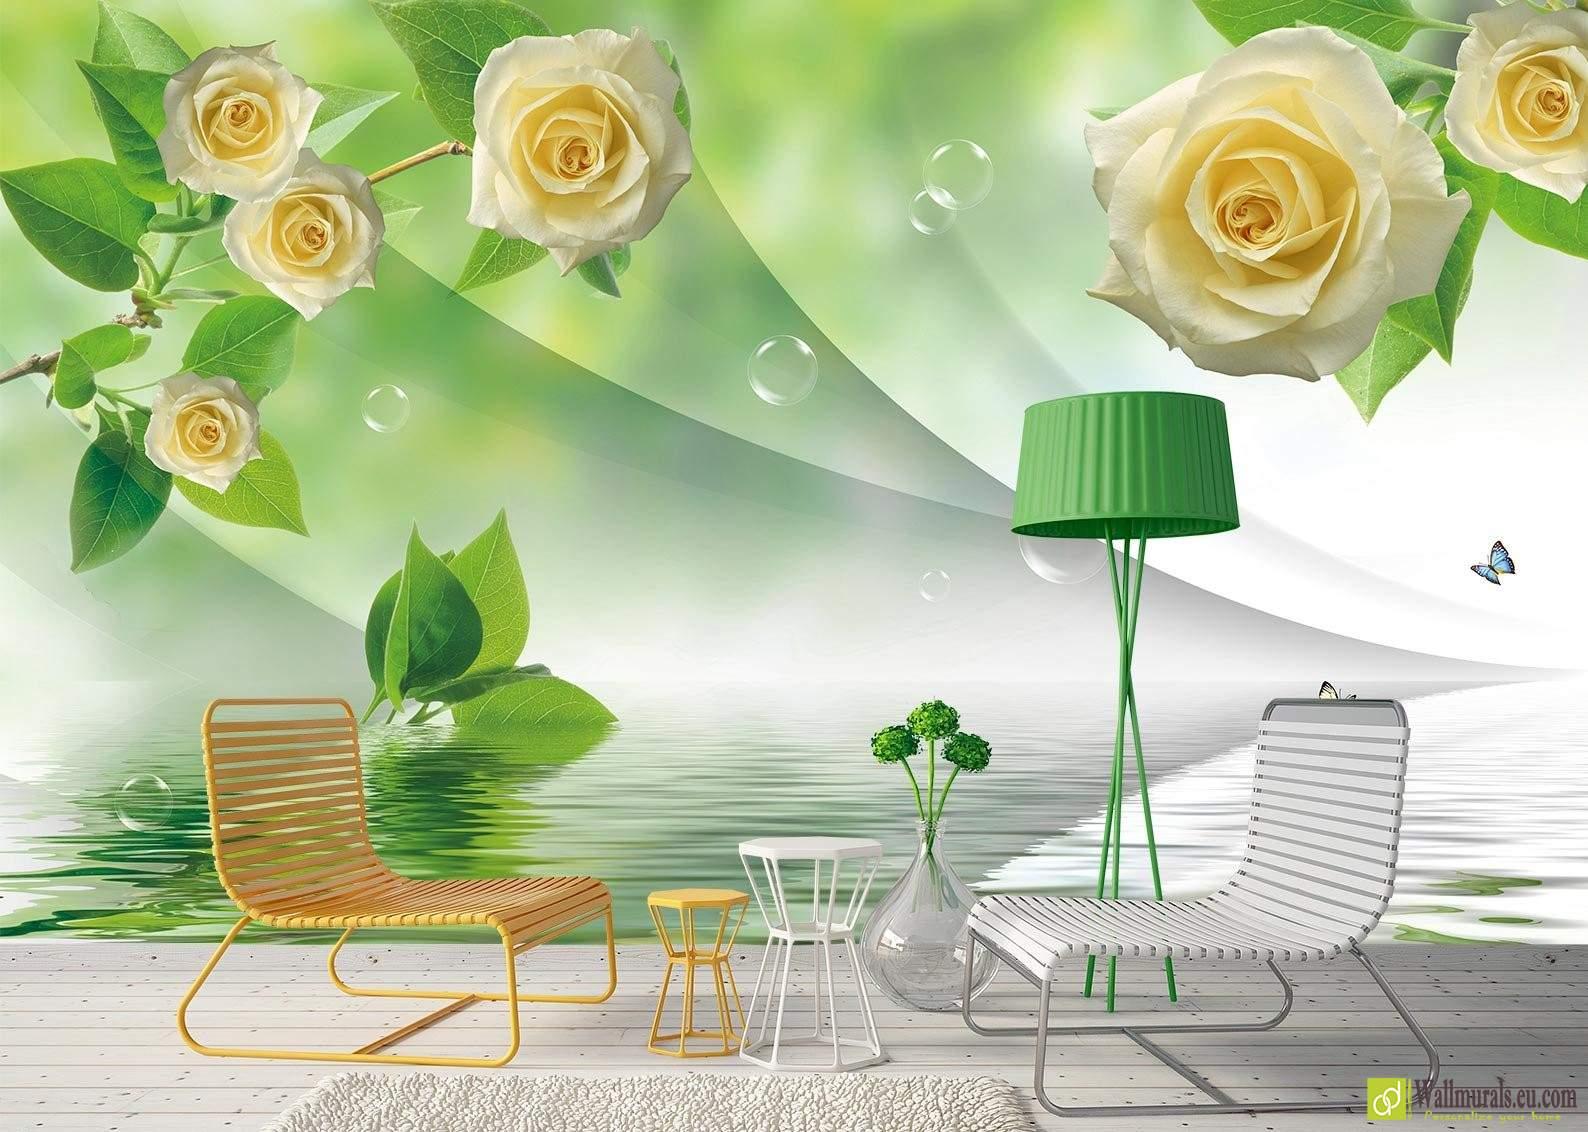 Fiori Gialli E Sfondo Verde Wallmuralseucom Carta Da Parati